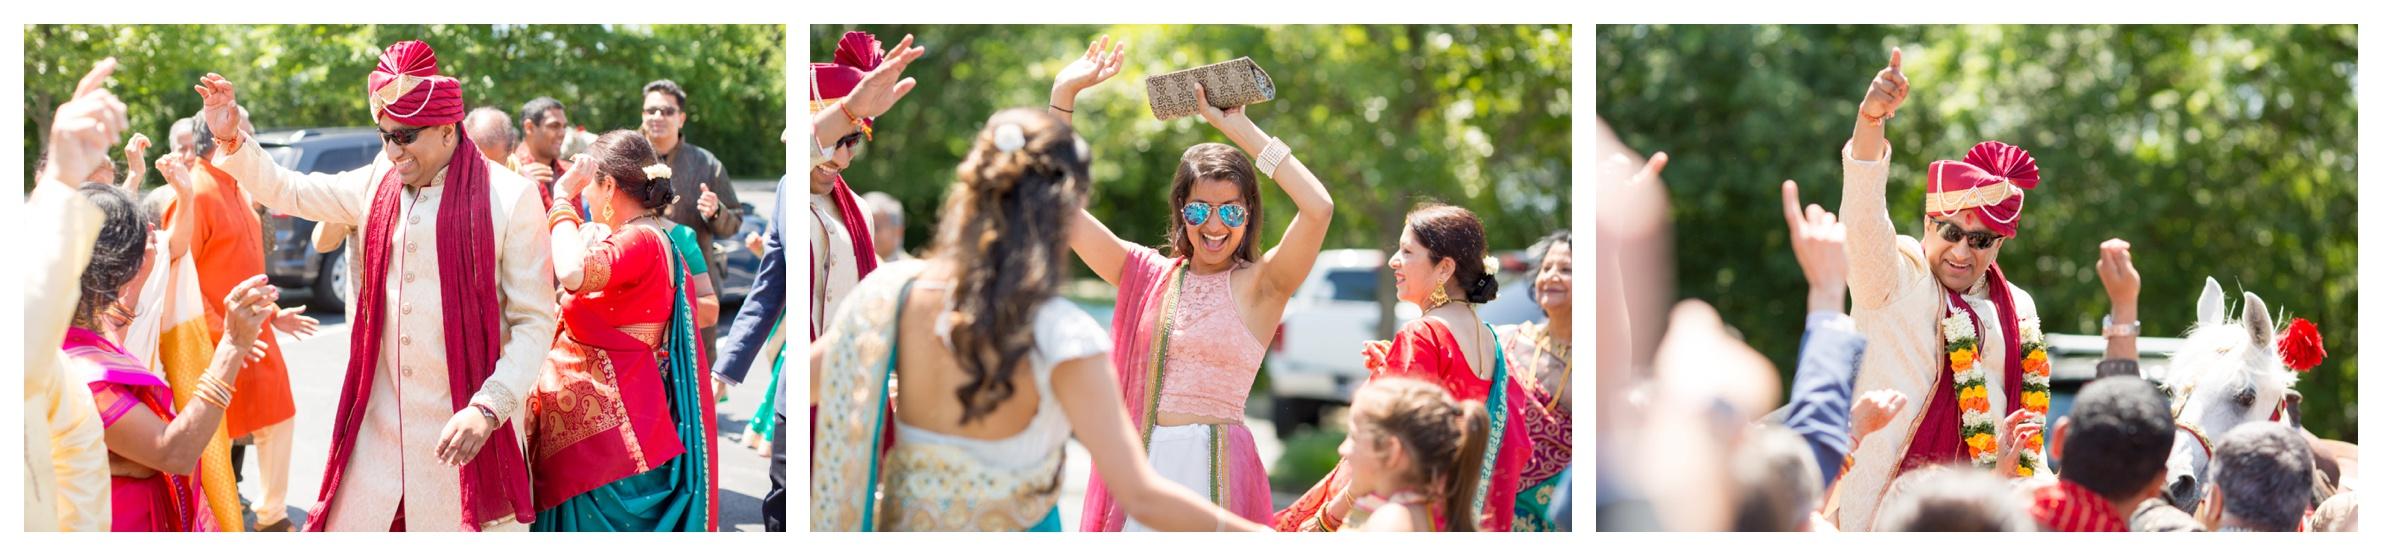 westin-northshore-wedding_0022.jpg